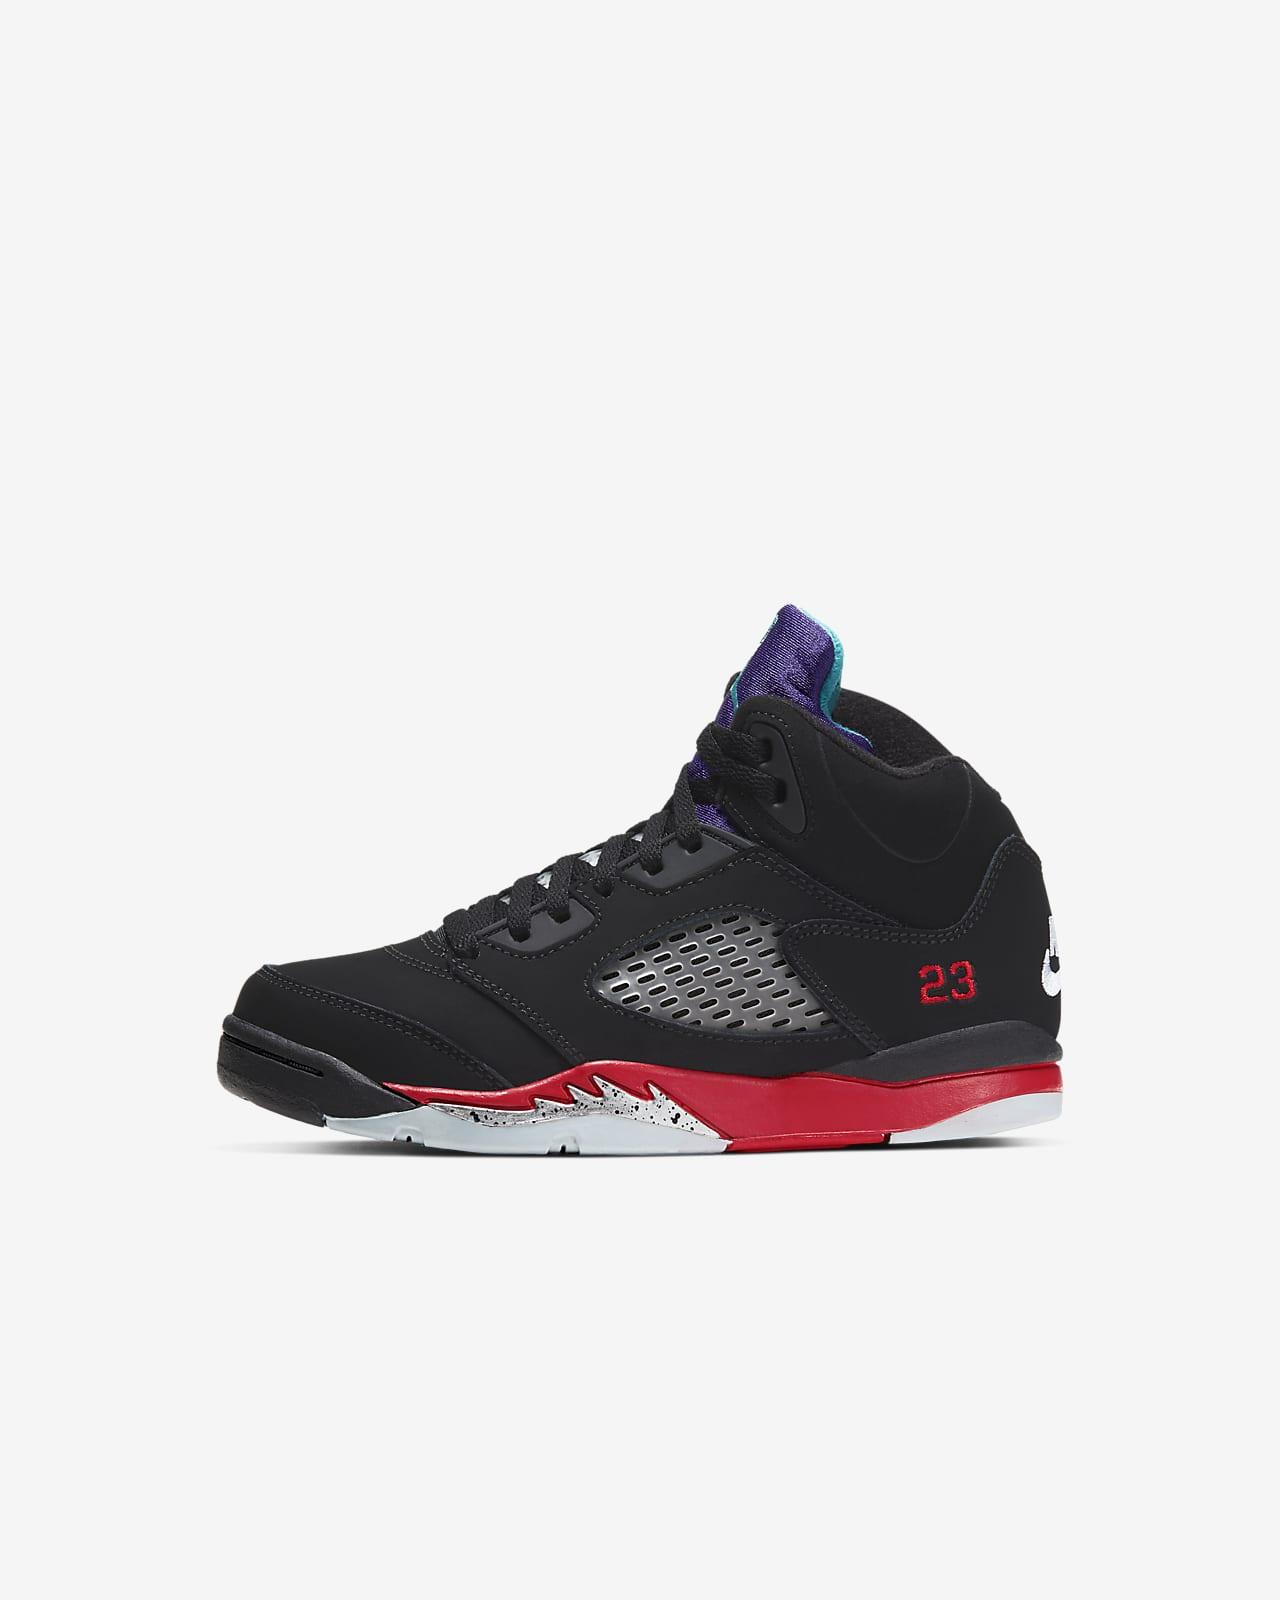 Jordan 5 Retro Younger Kids' Shoe. Nike SA